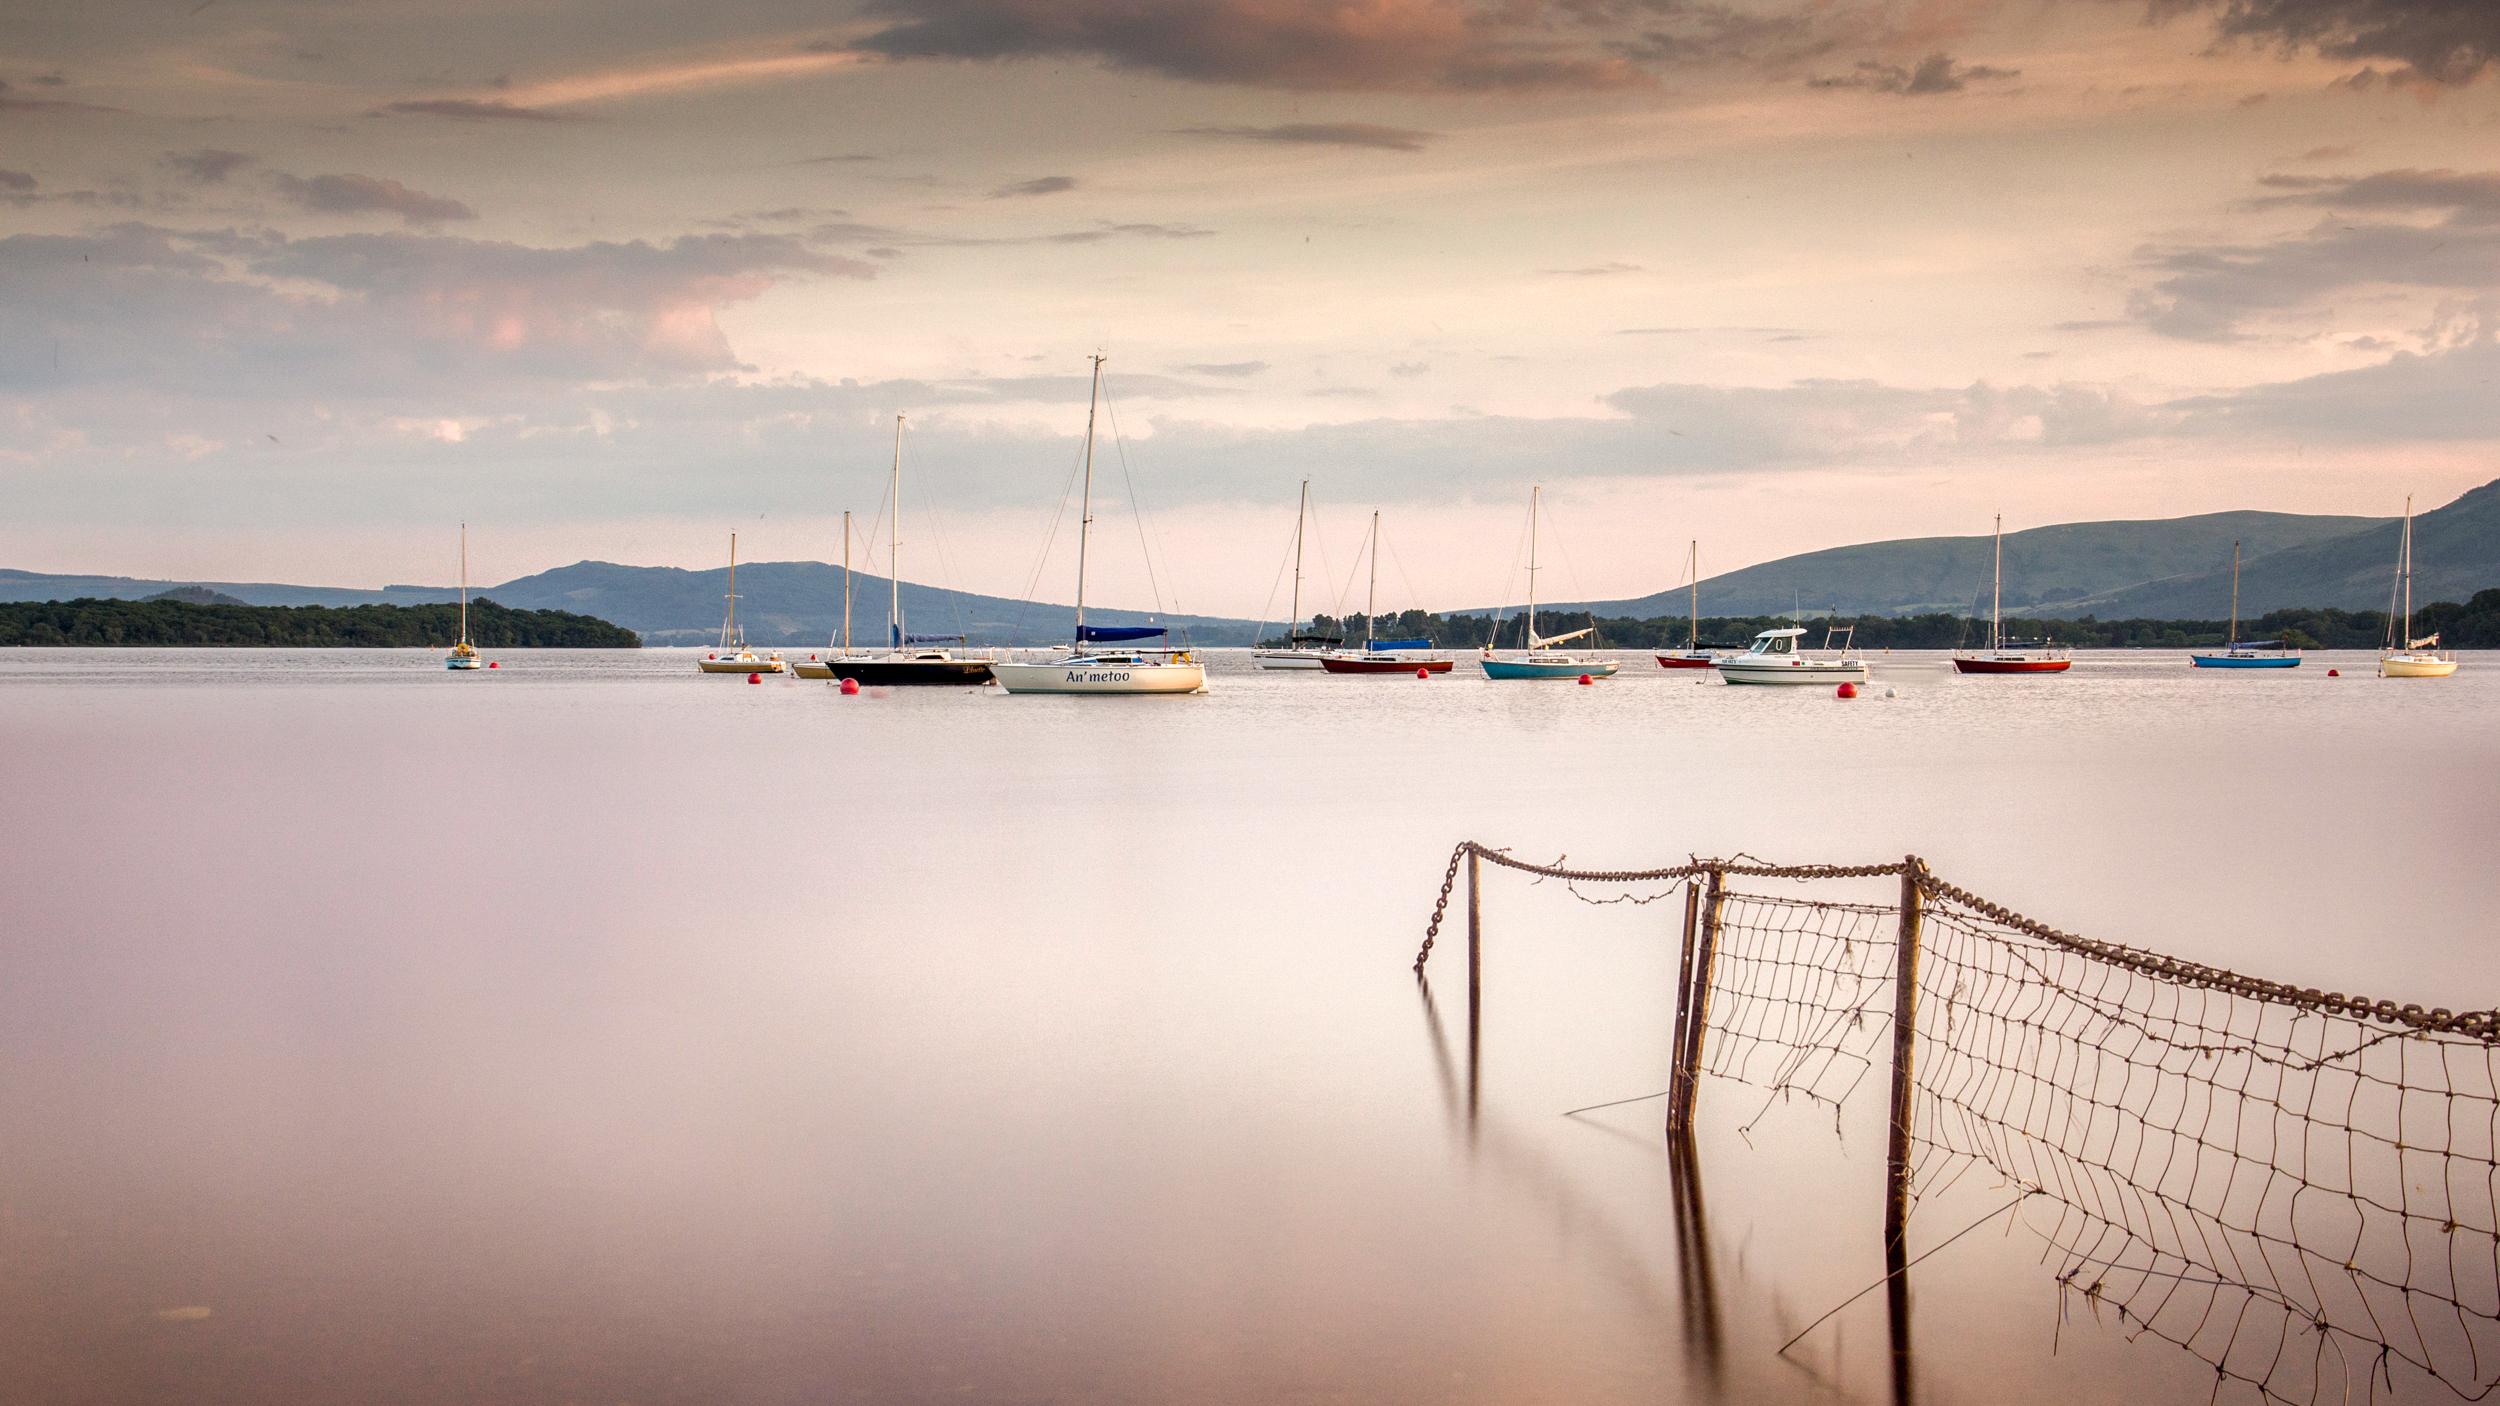 rowardennan, Scotland